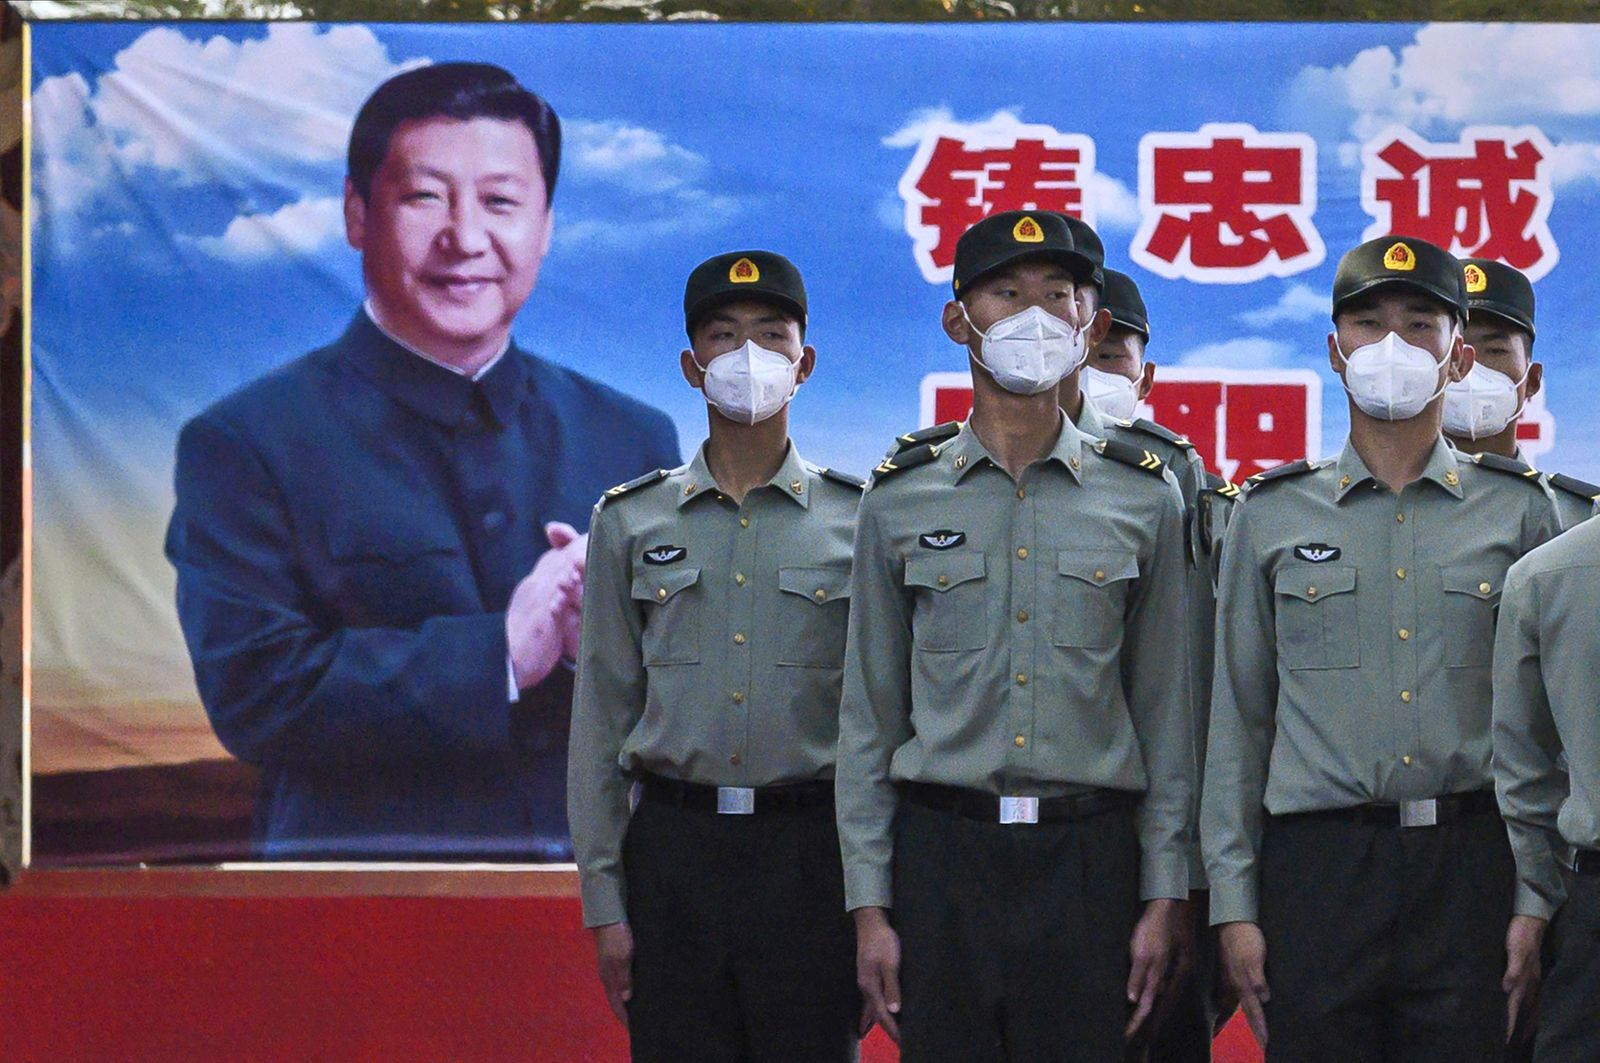 China Slowly Recovers From Coronavirus Outbreak